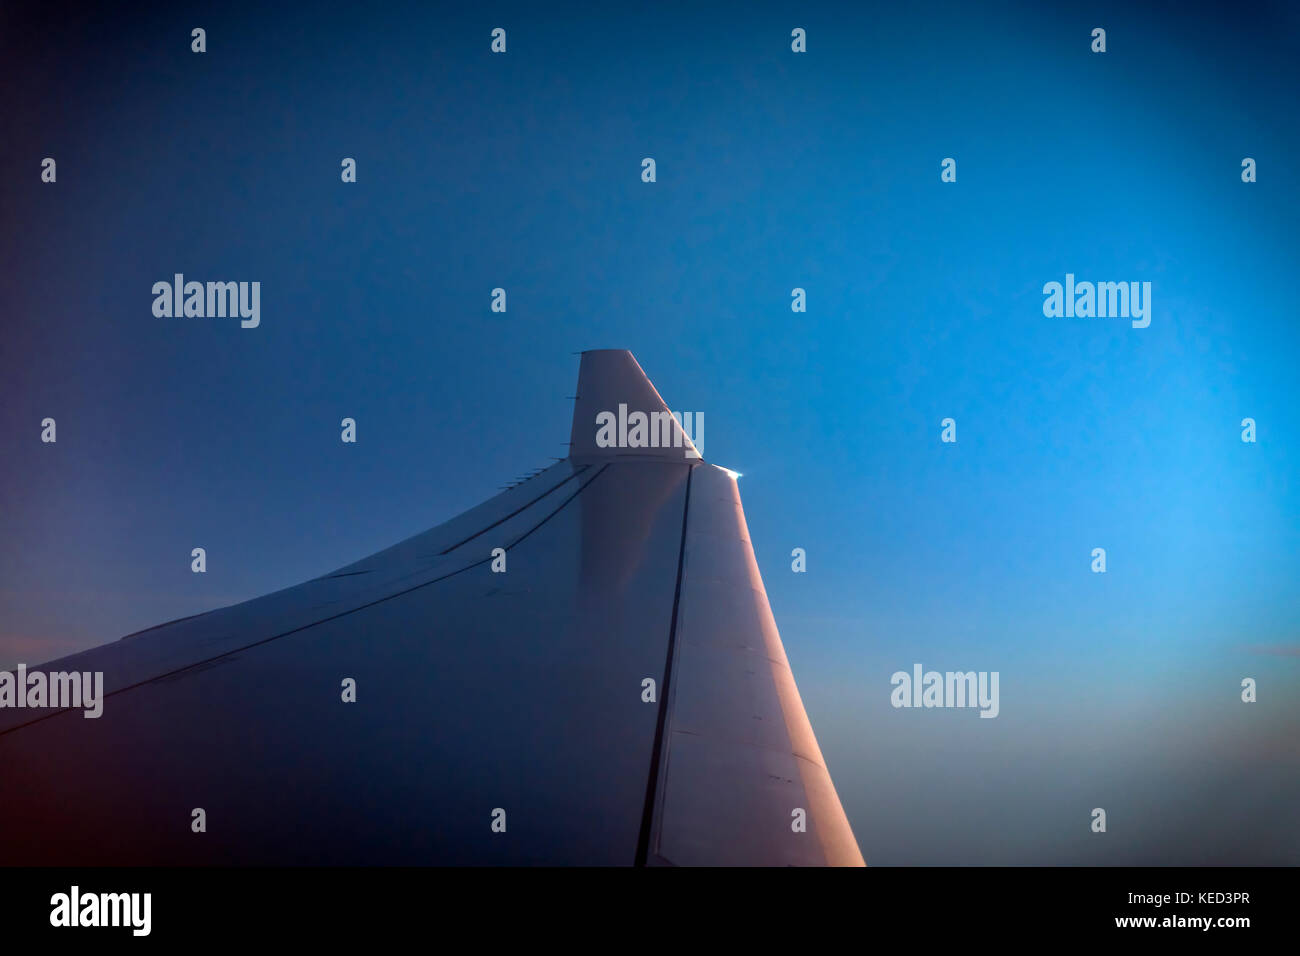 Airplane wing at sunrise. - Stock Image